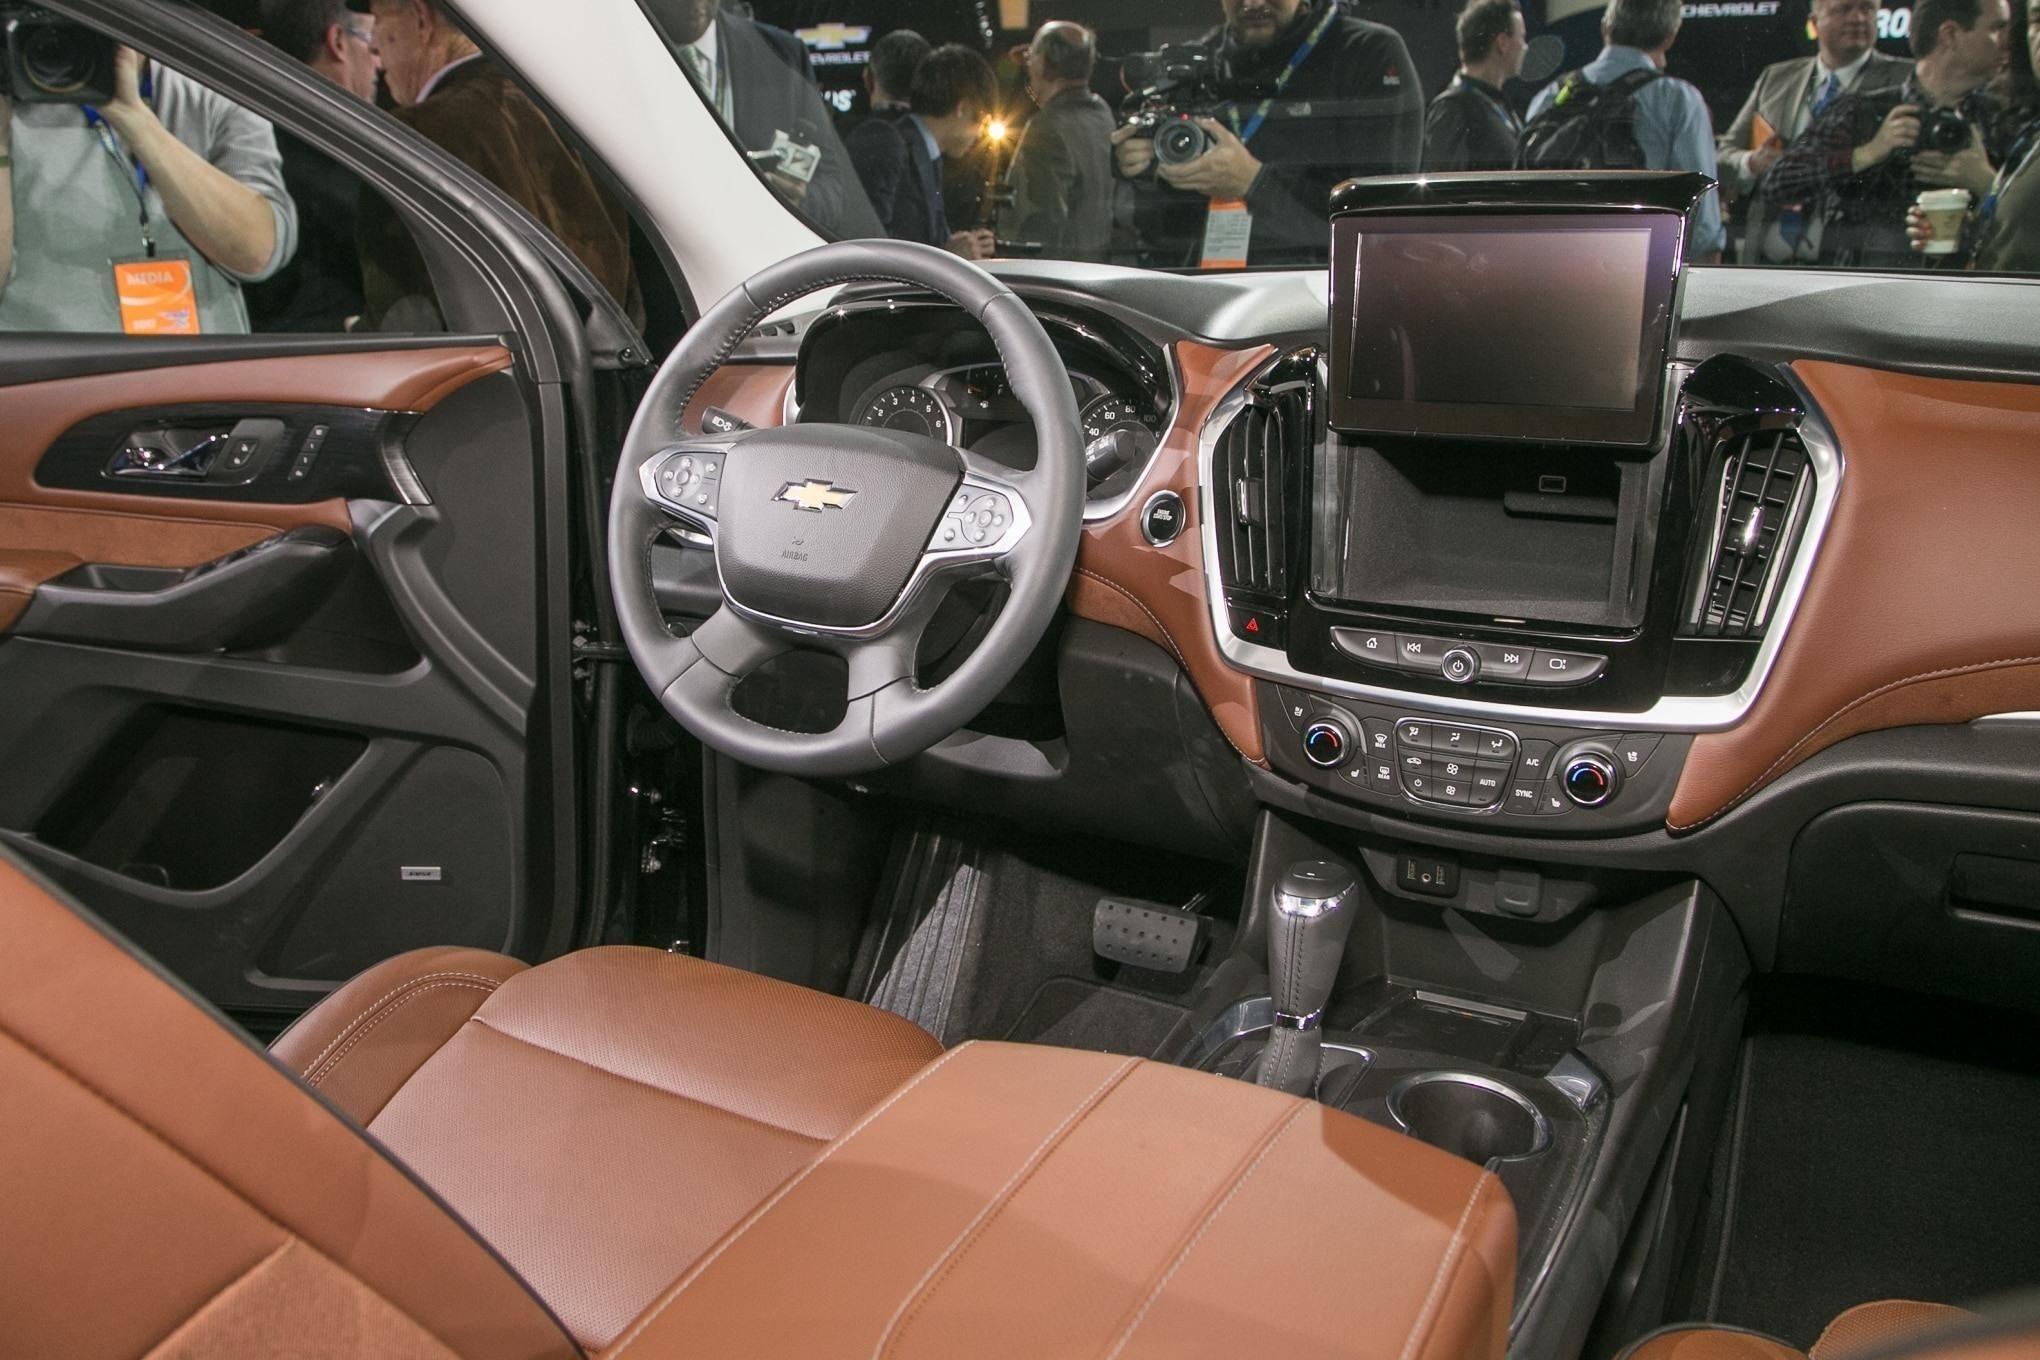 2019 Chevrolet Traverse Price Car 2018 2019 With 2019 Chevrolet Traverse With Images Chevrolet Traverse Chevrolet Traverse Interior Limousine Interior